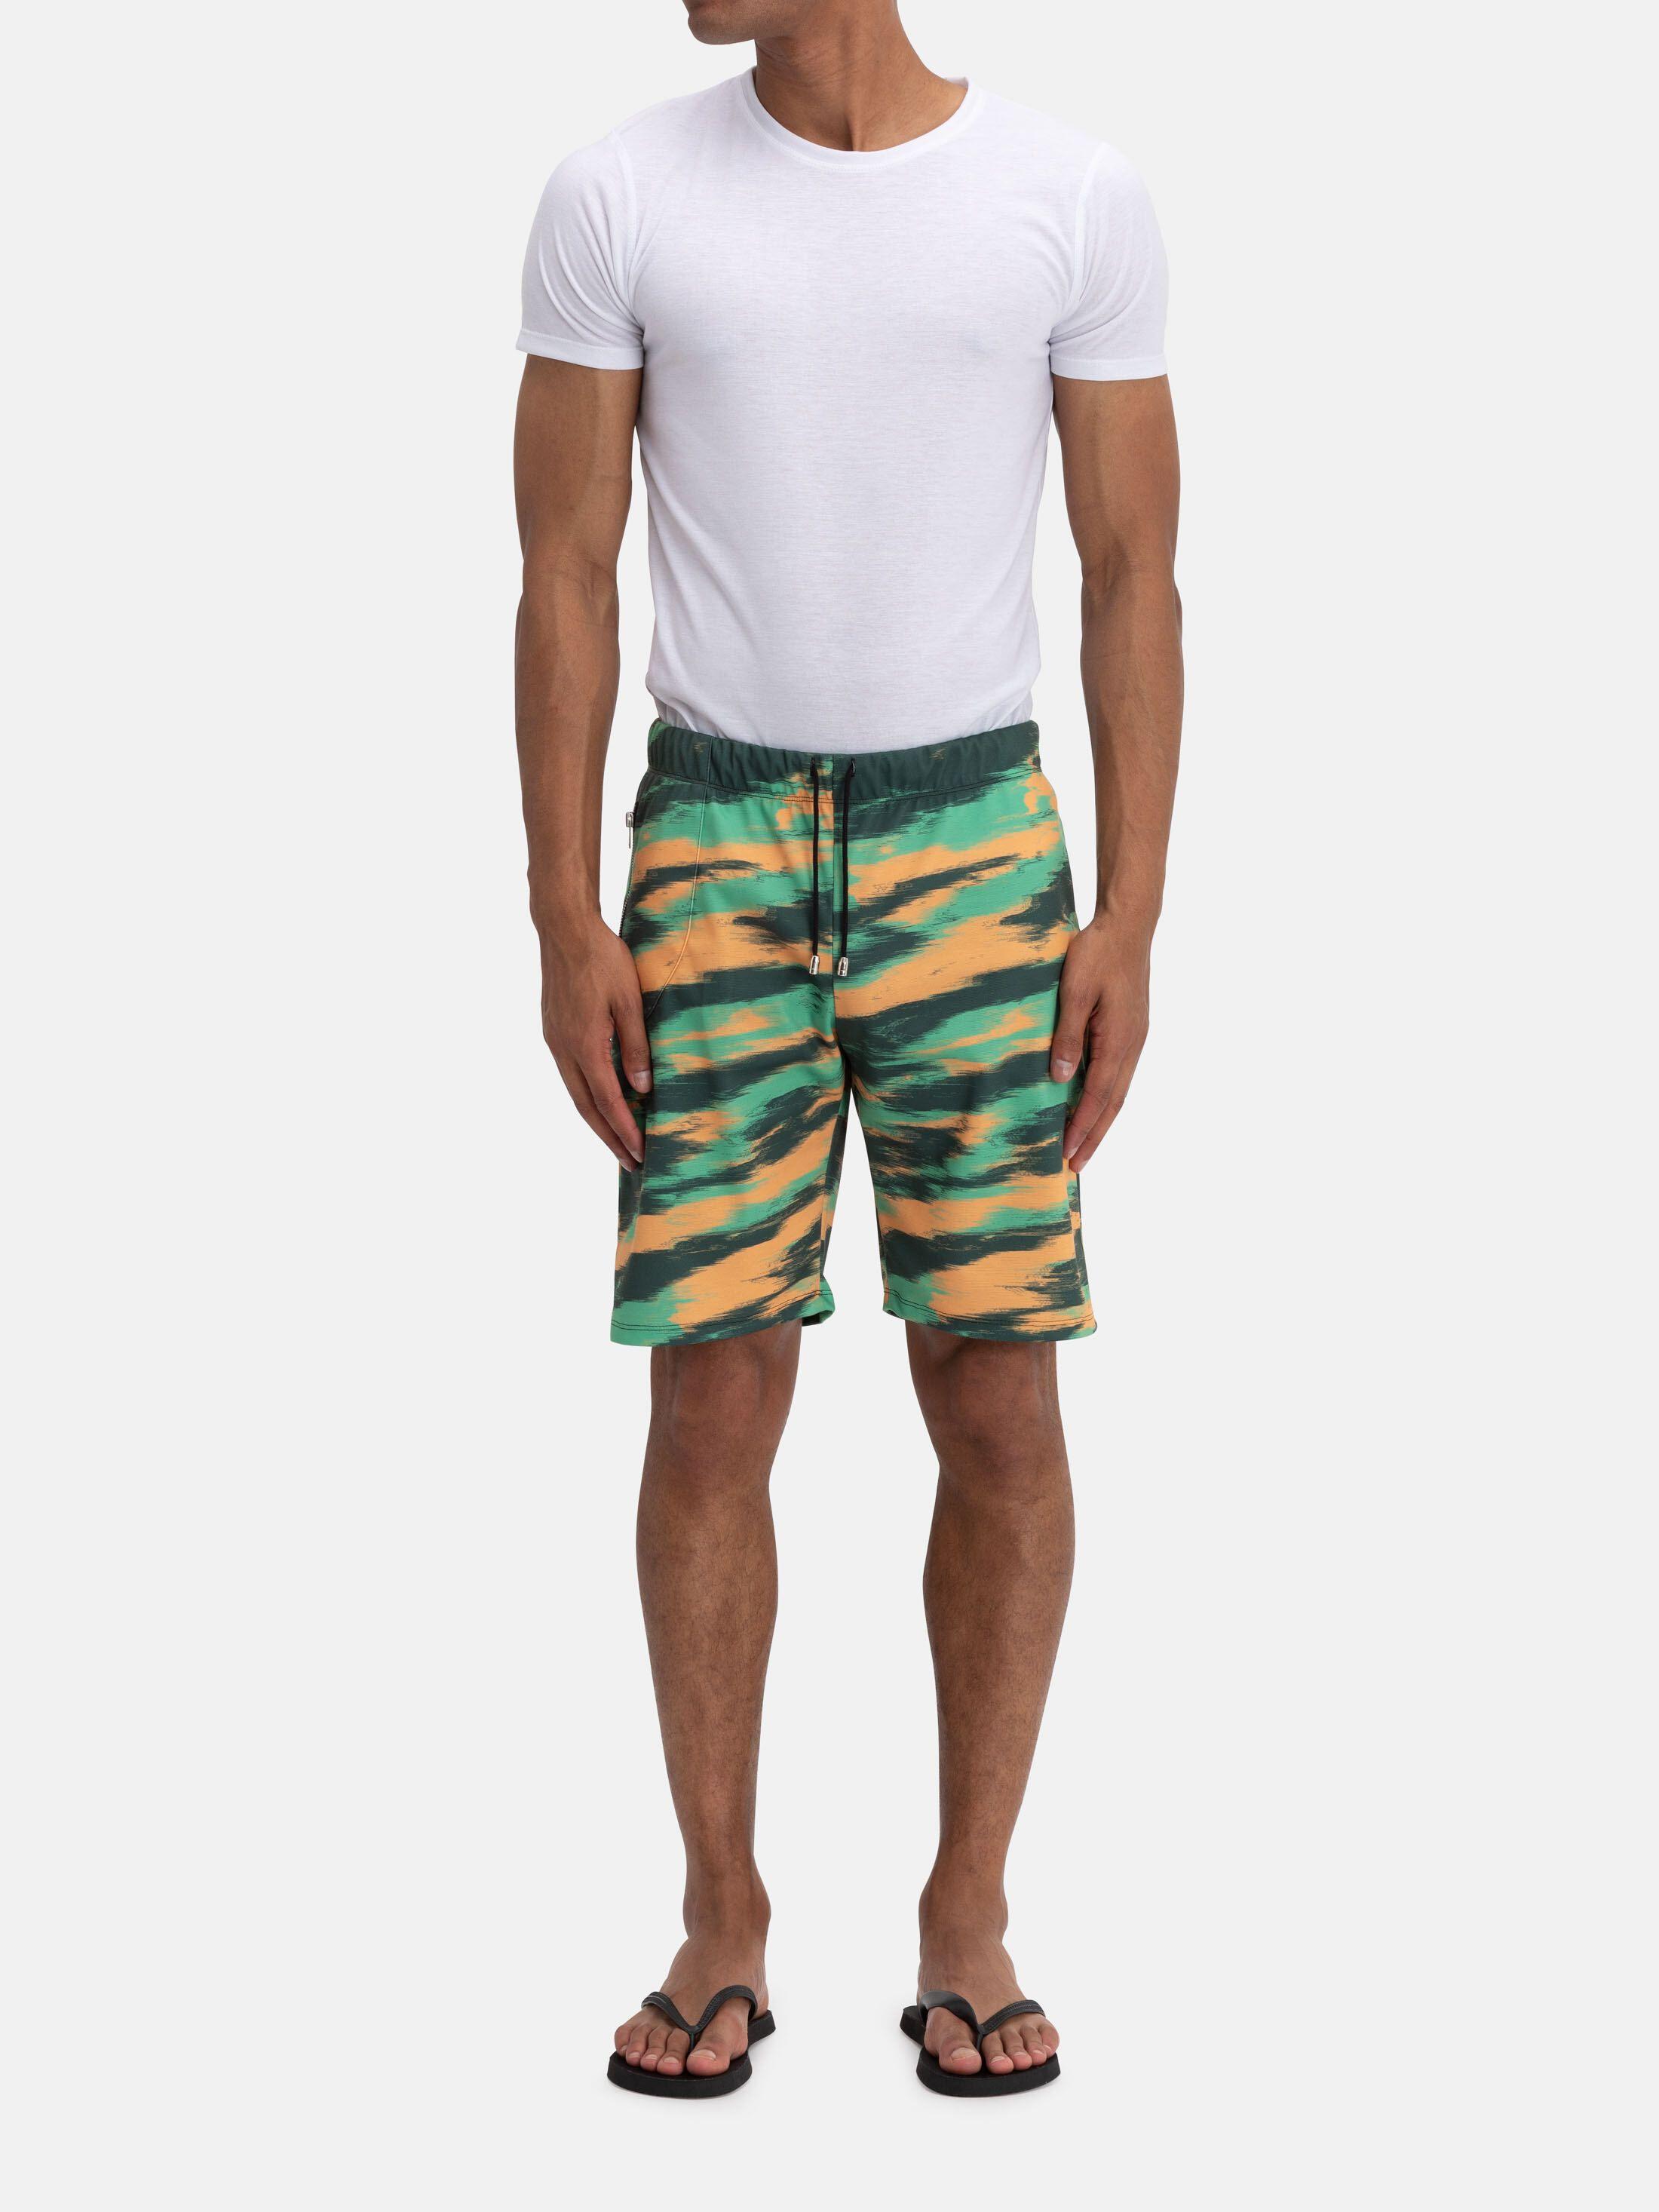 custom printed shorts